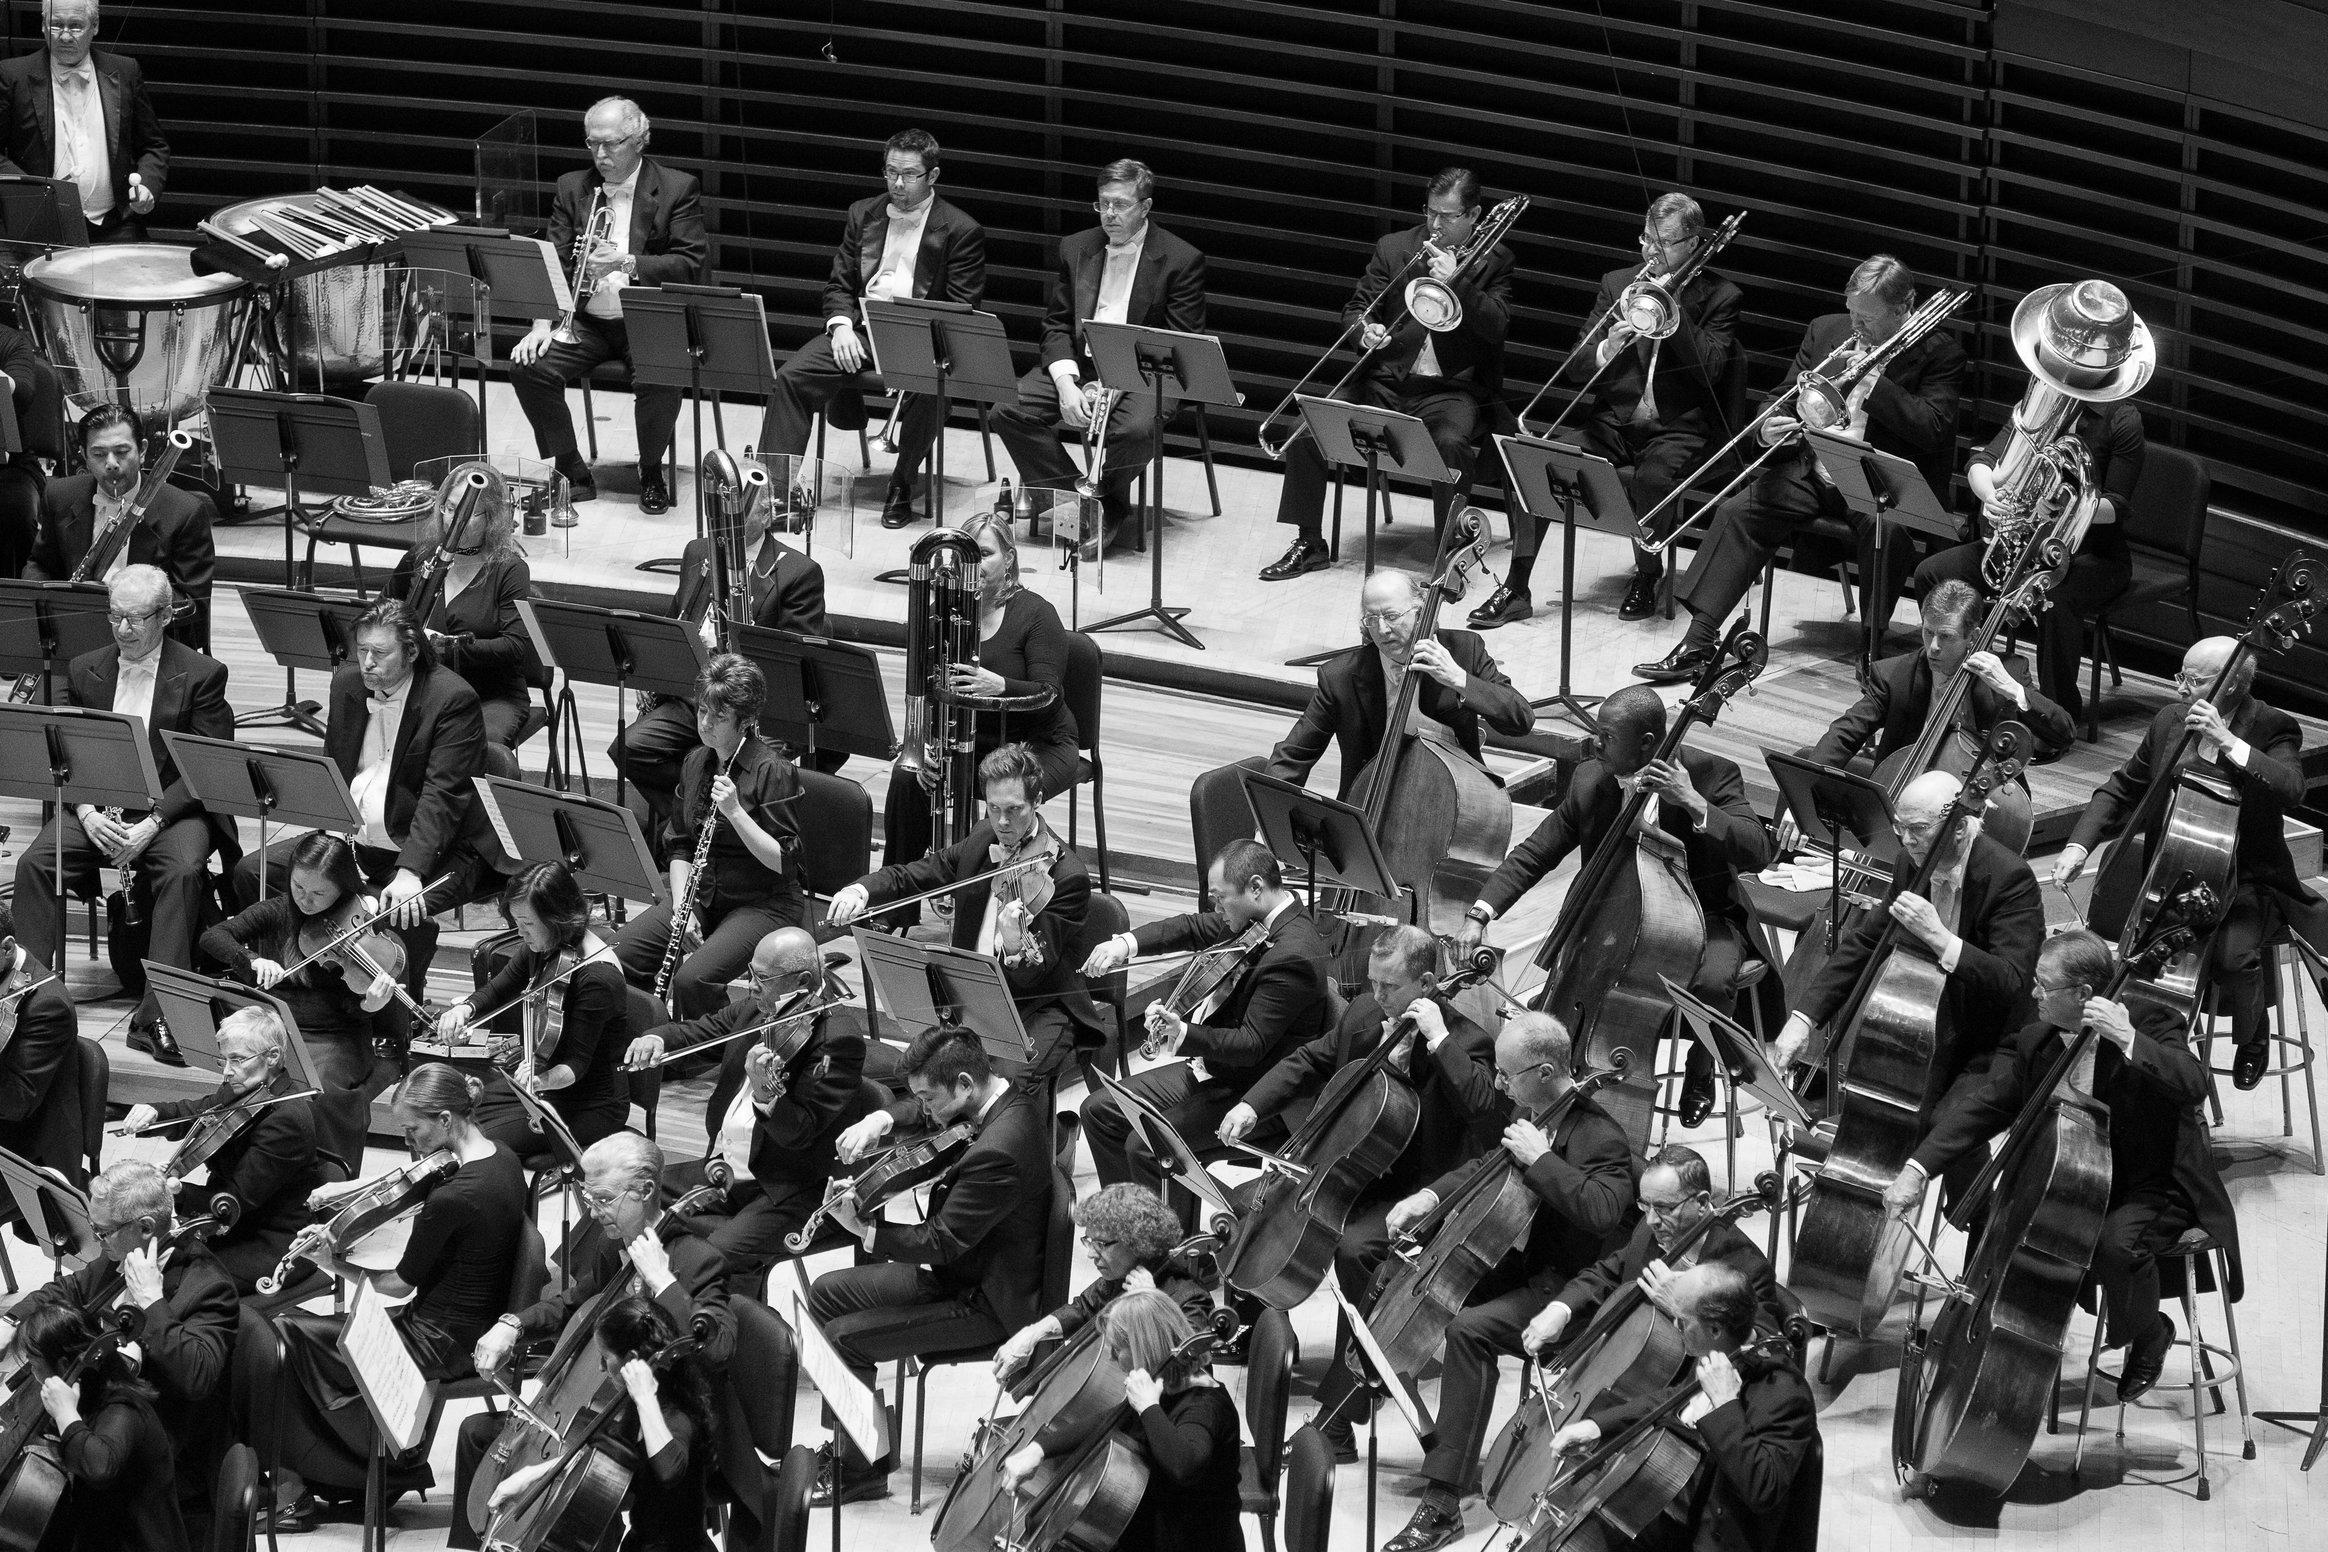 Cellos-Violas-Basses-Winds-Brass-2015-12-03-117(JessicaGriffin).jpg